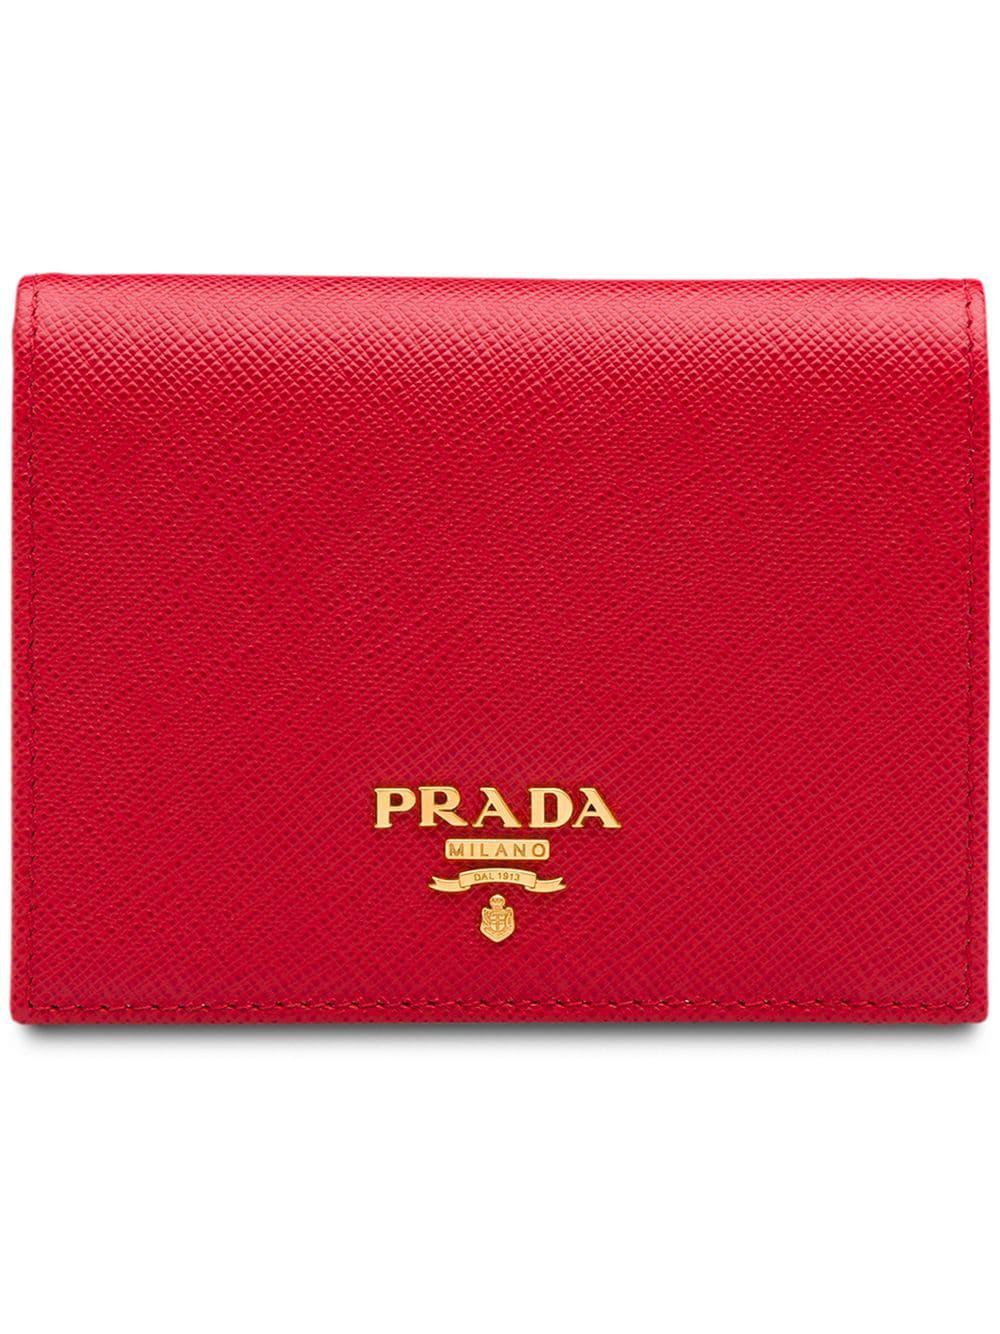 894d27eb7c12e9 Prada Small Saffiano Leather Wallet - Red   ModeSens